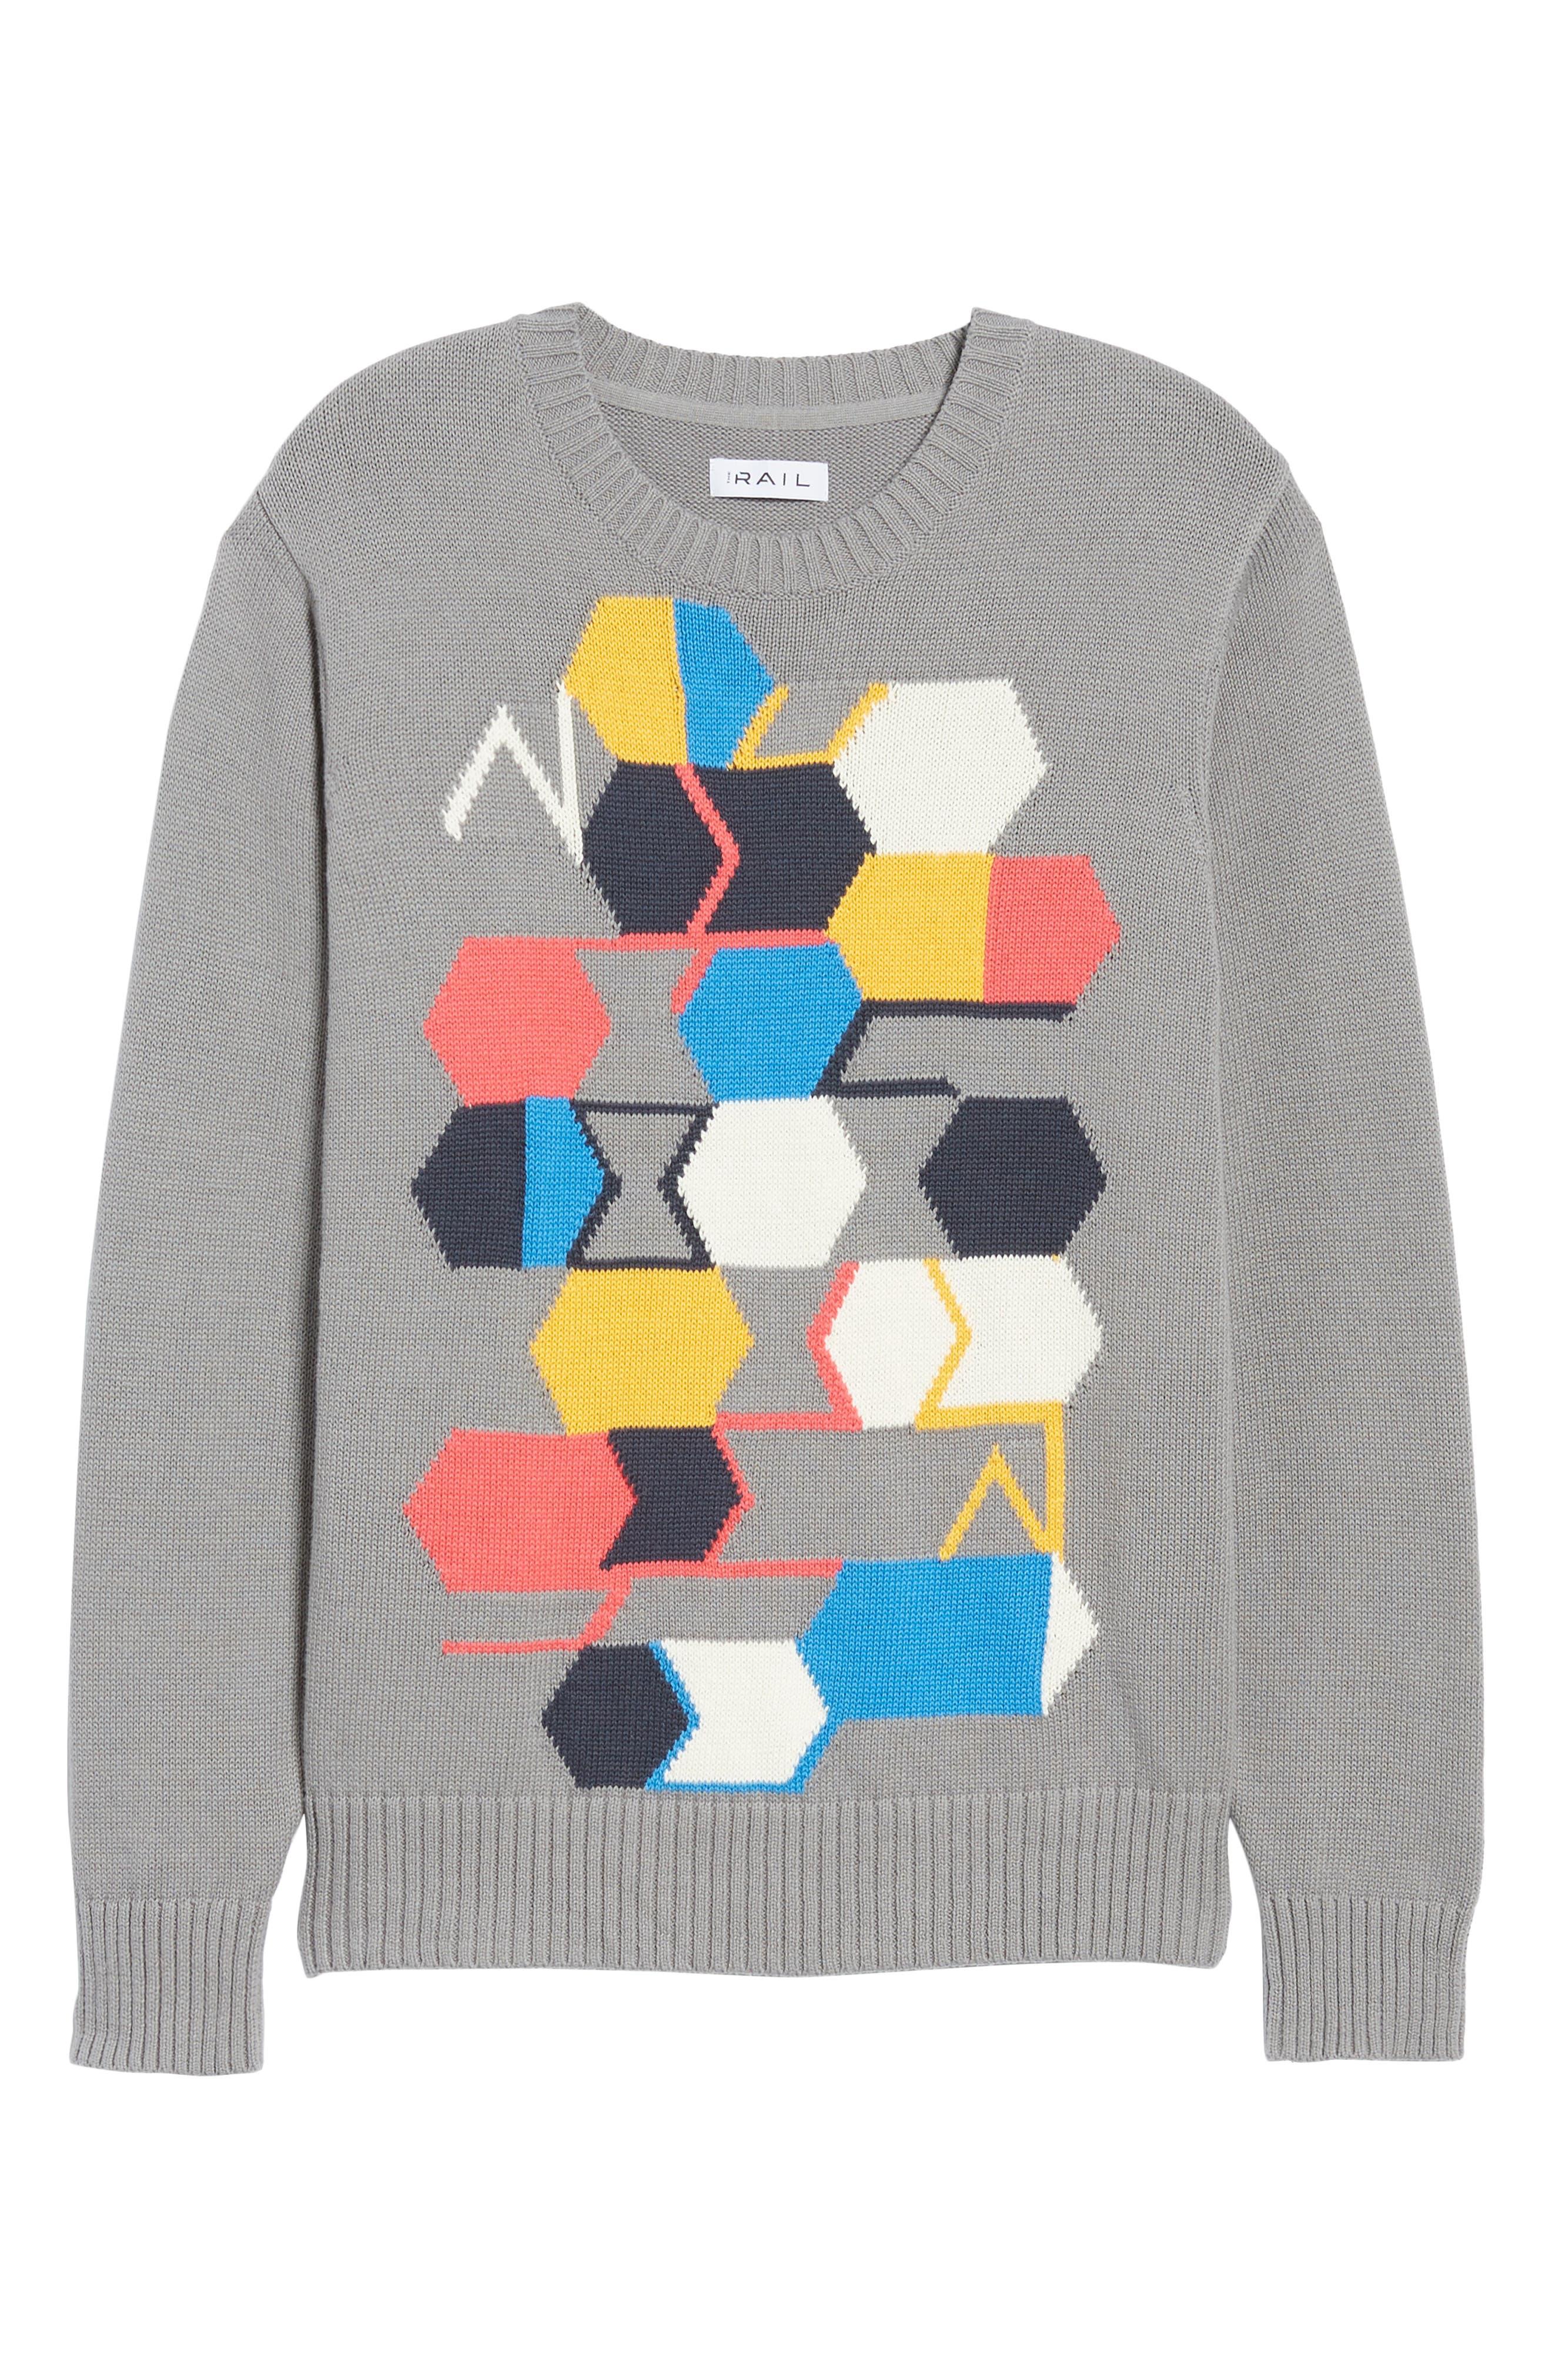 Geo Pattern Sweater,                             Alternate thumbnail 6, color,                             GREY MULTI GEO BLOCK